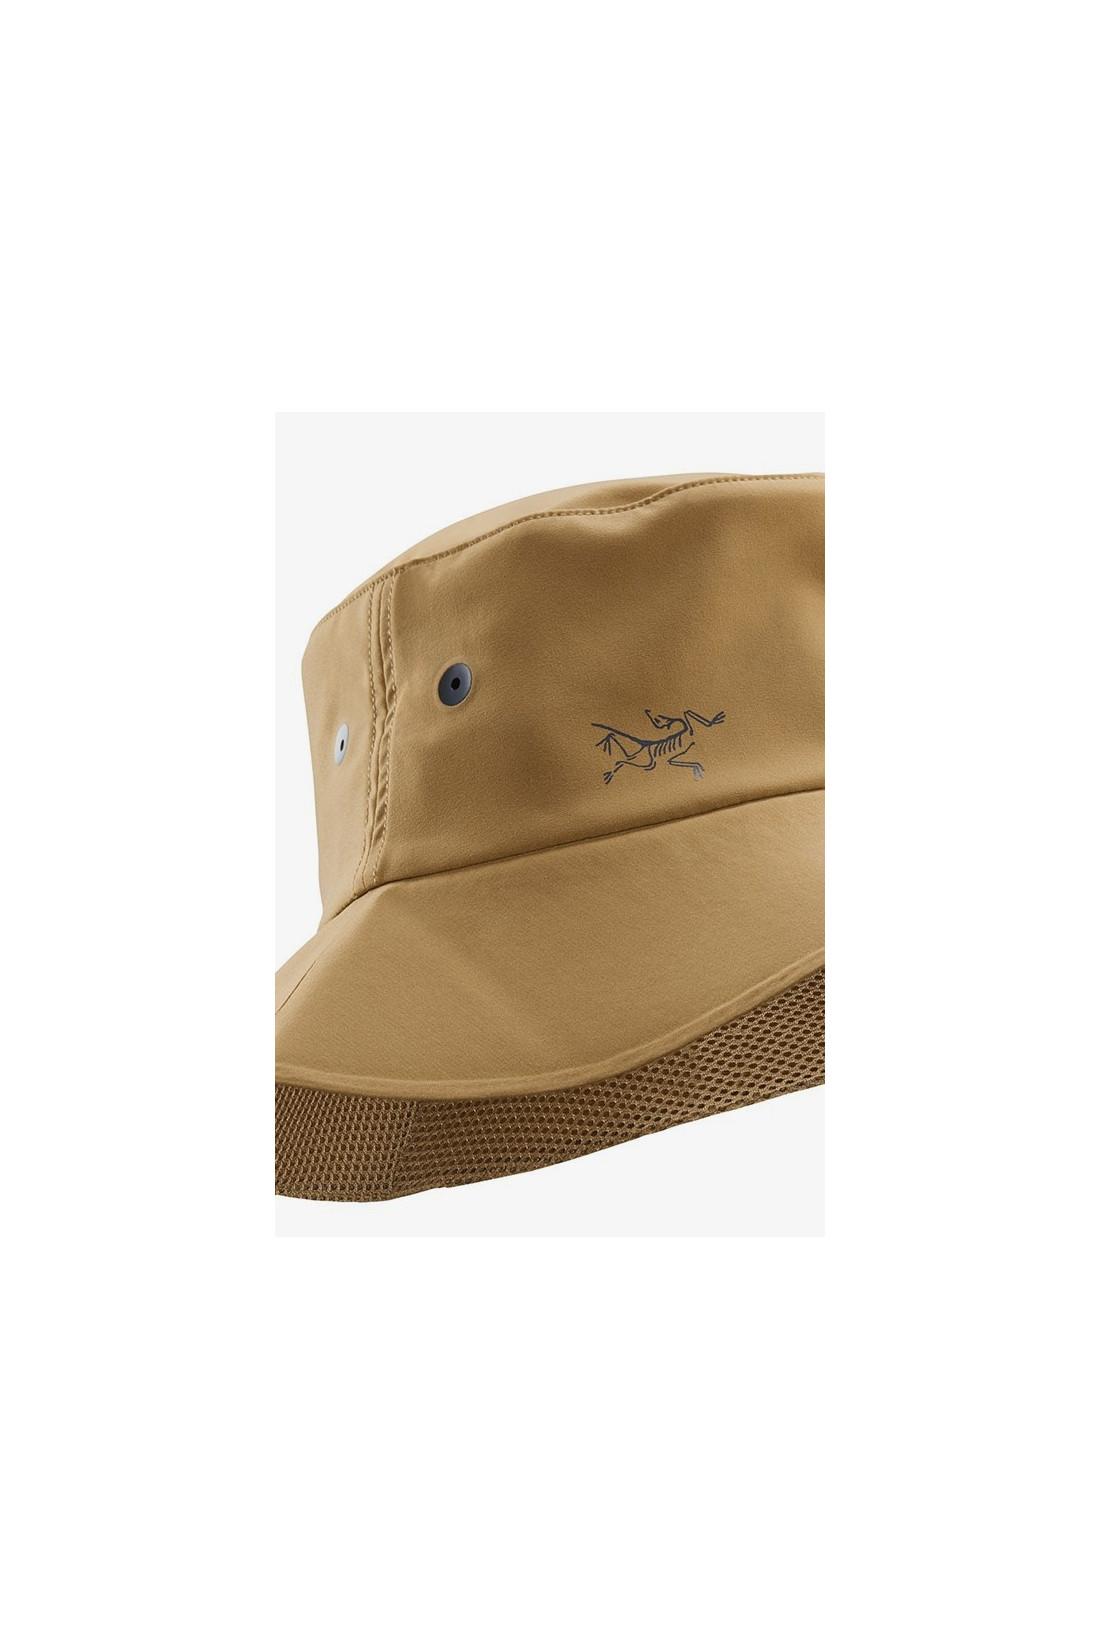 ARC'TERYX / Sinsolo hat 23192 Elk